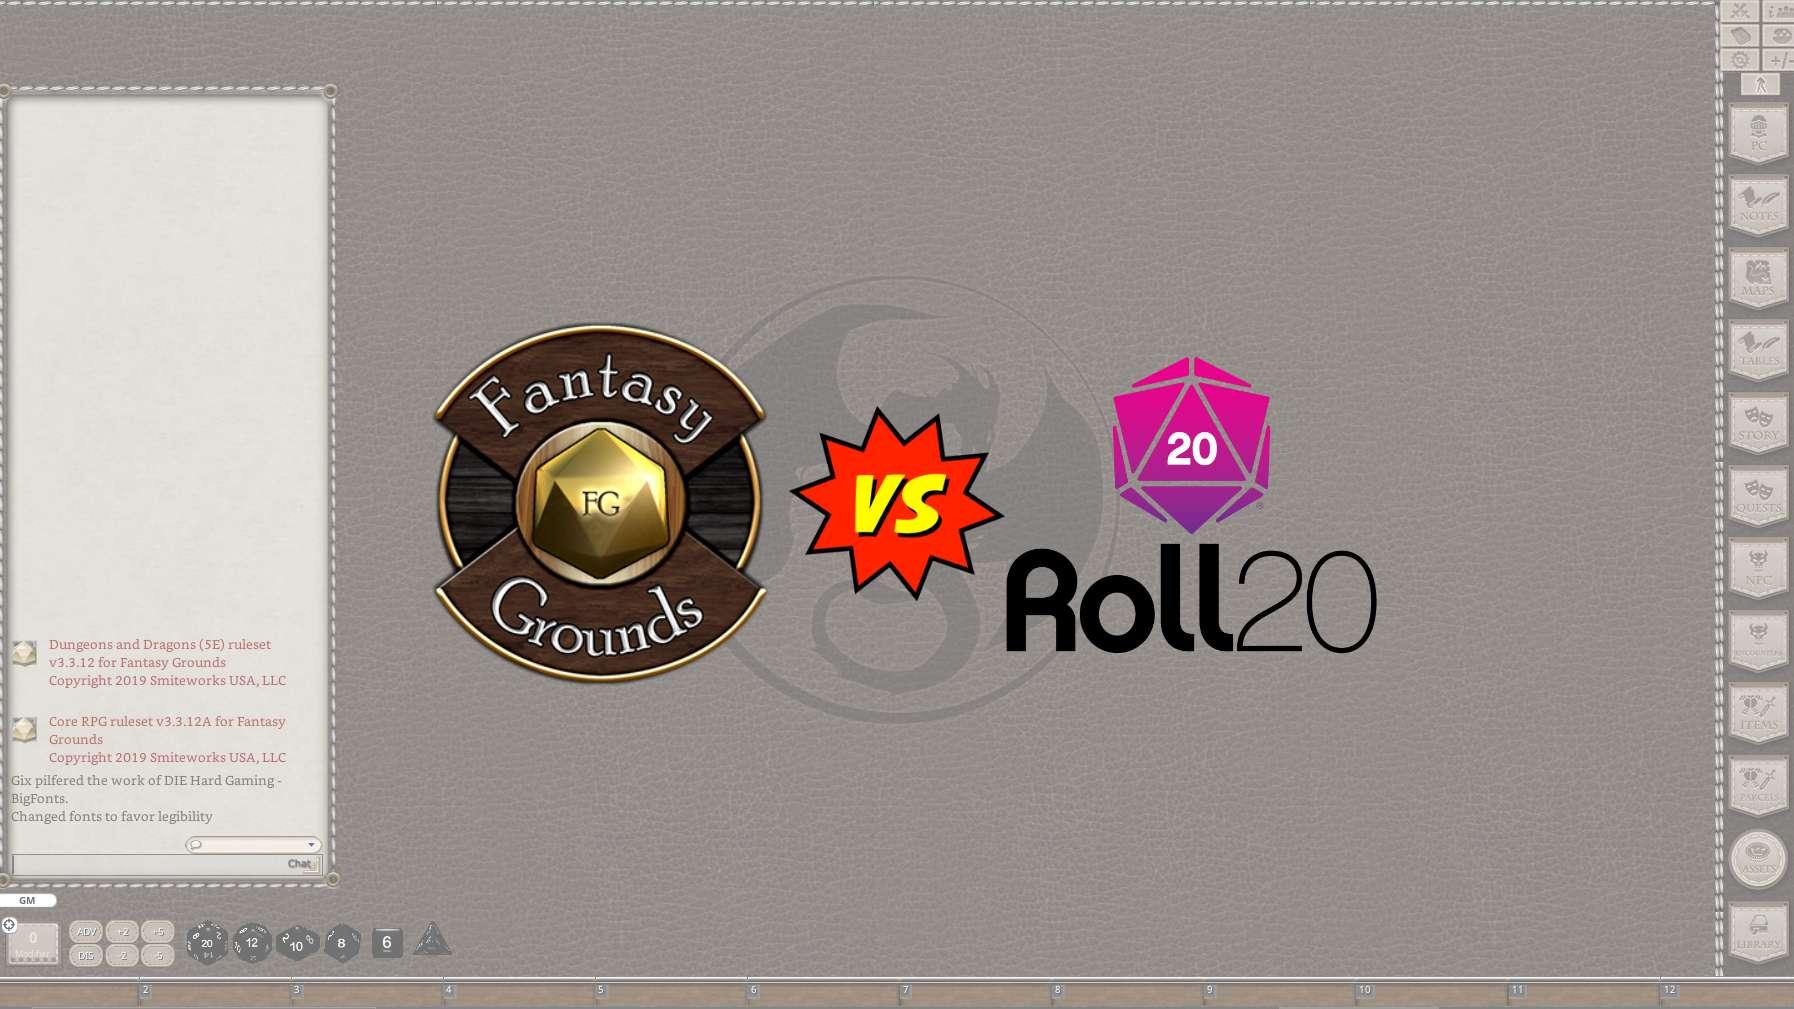 Fantasy Grounds Unity vs Roll20